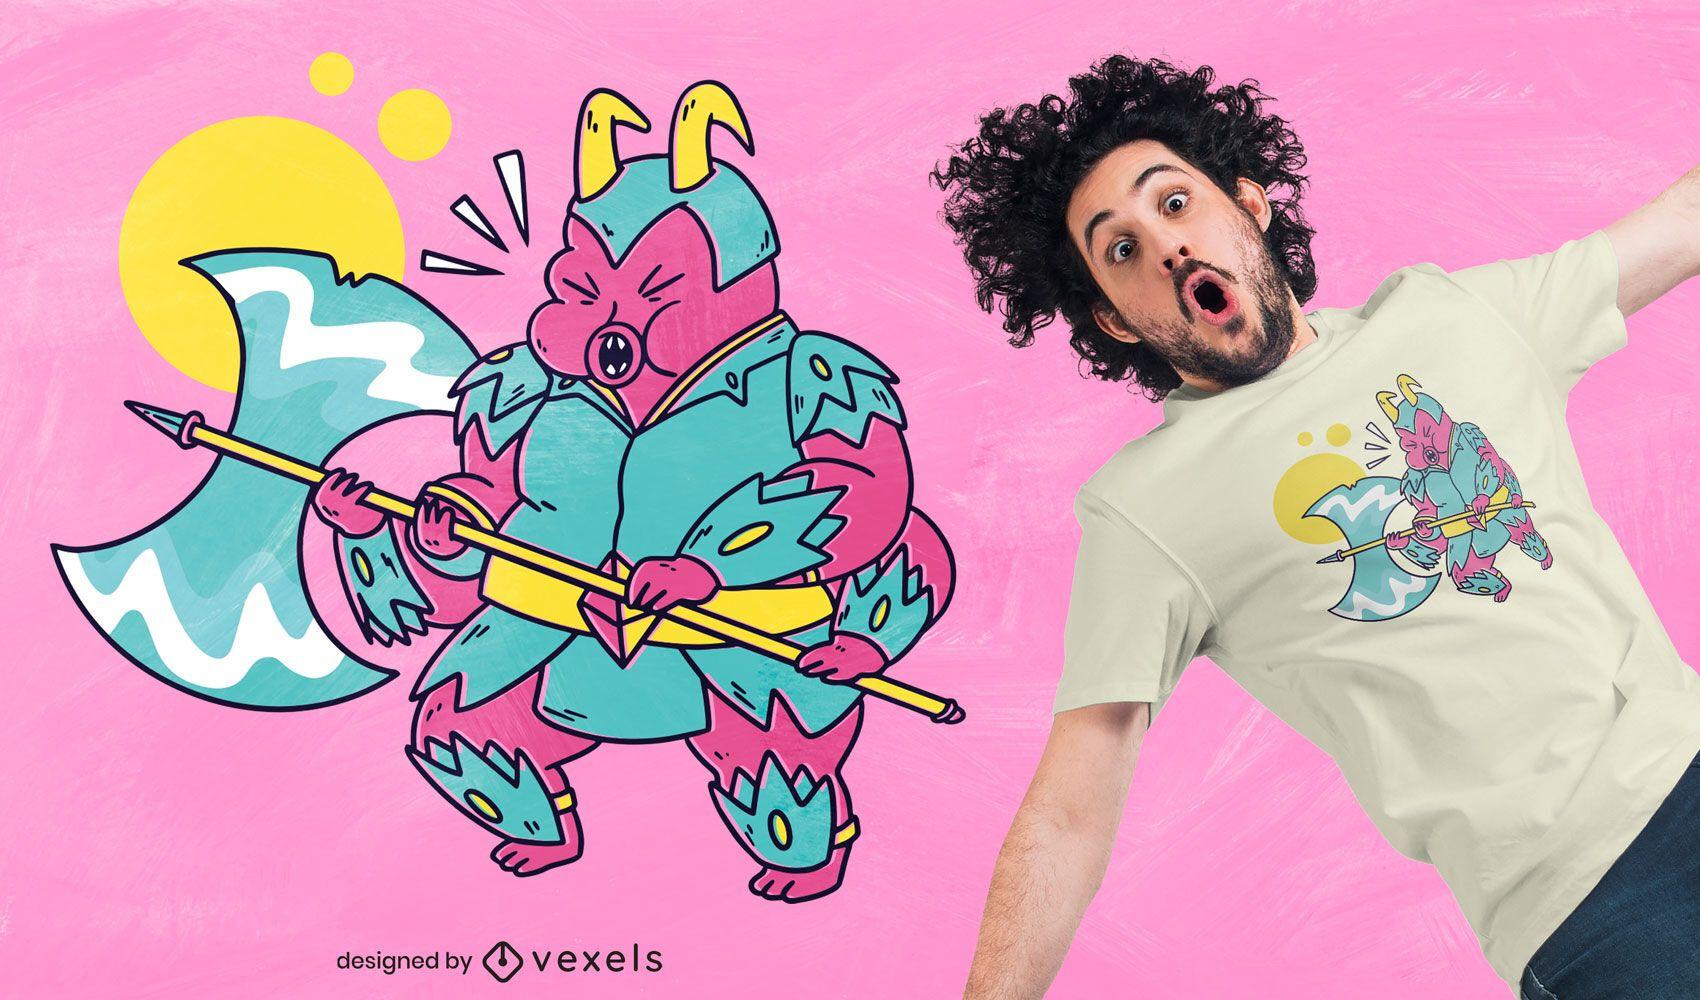 Berserker tardigrade t-shirt design